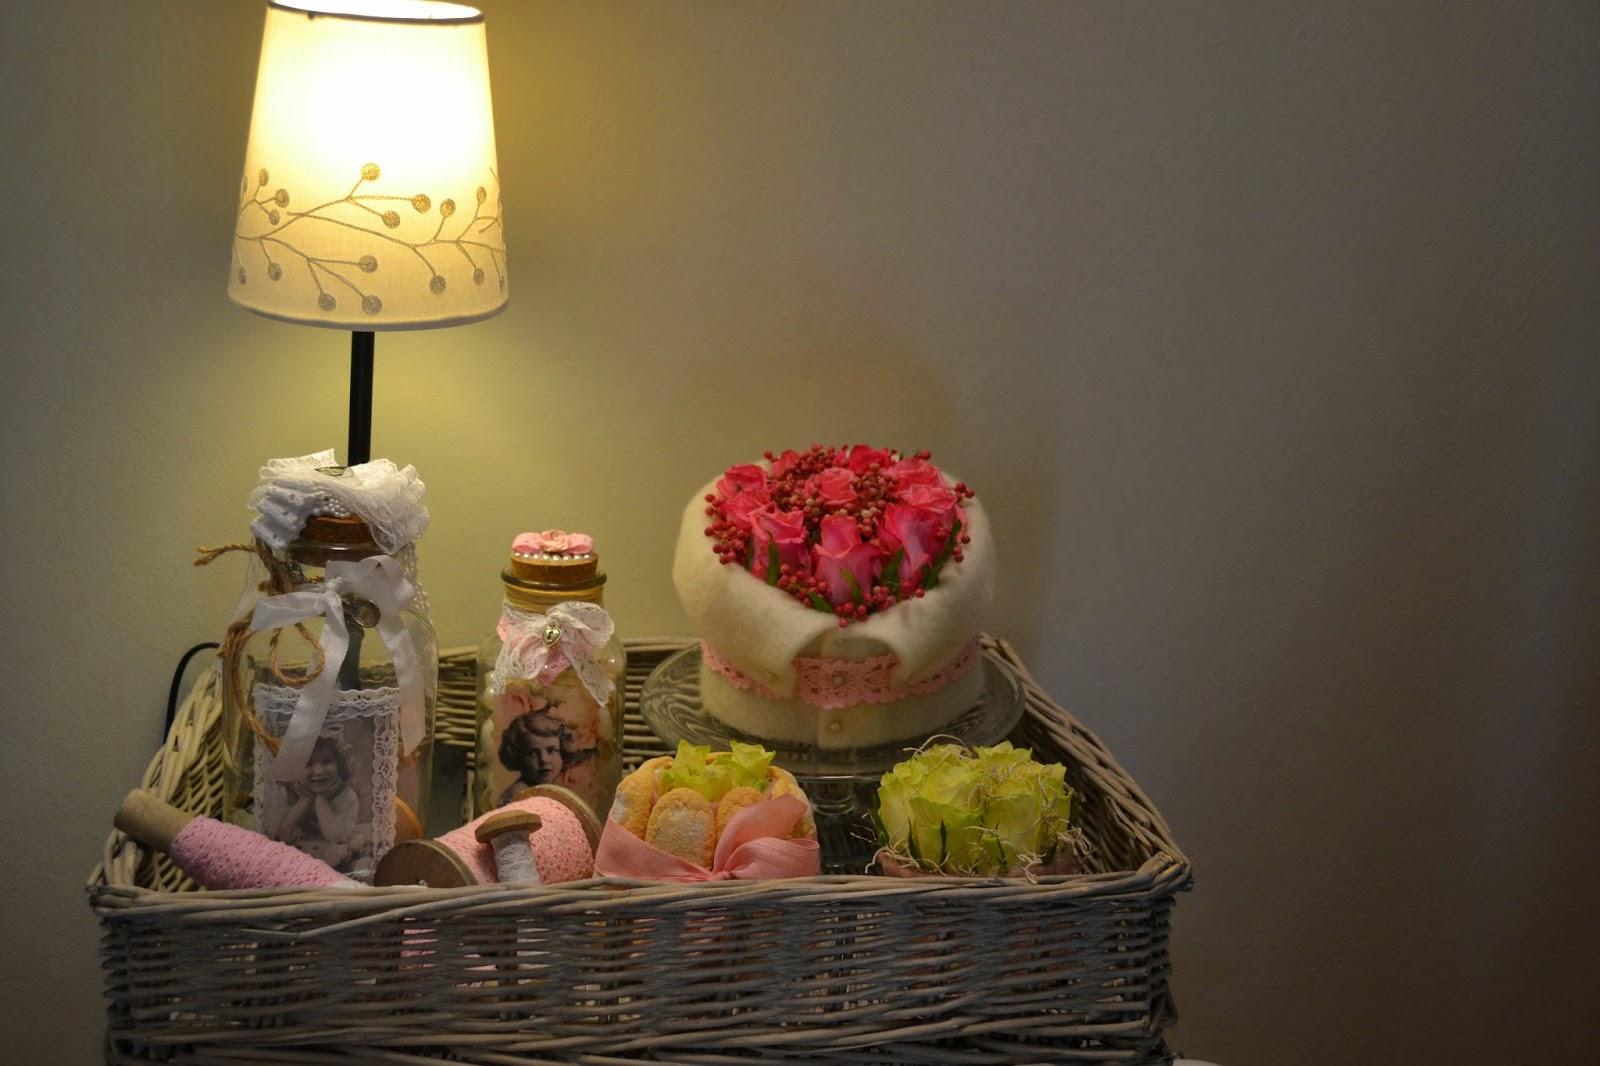 Sylca home decoratie adcosynails - Home decoratie met tomettes ...